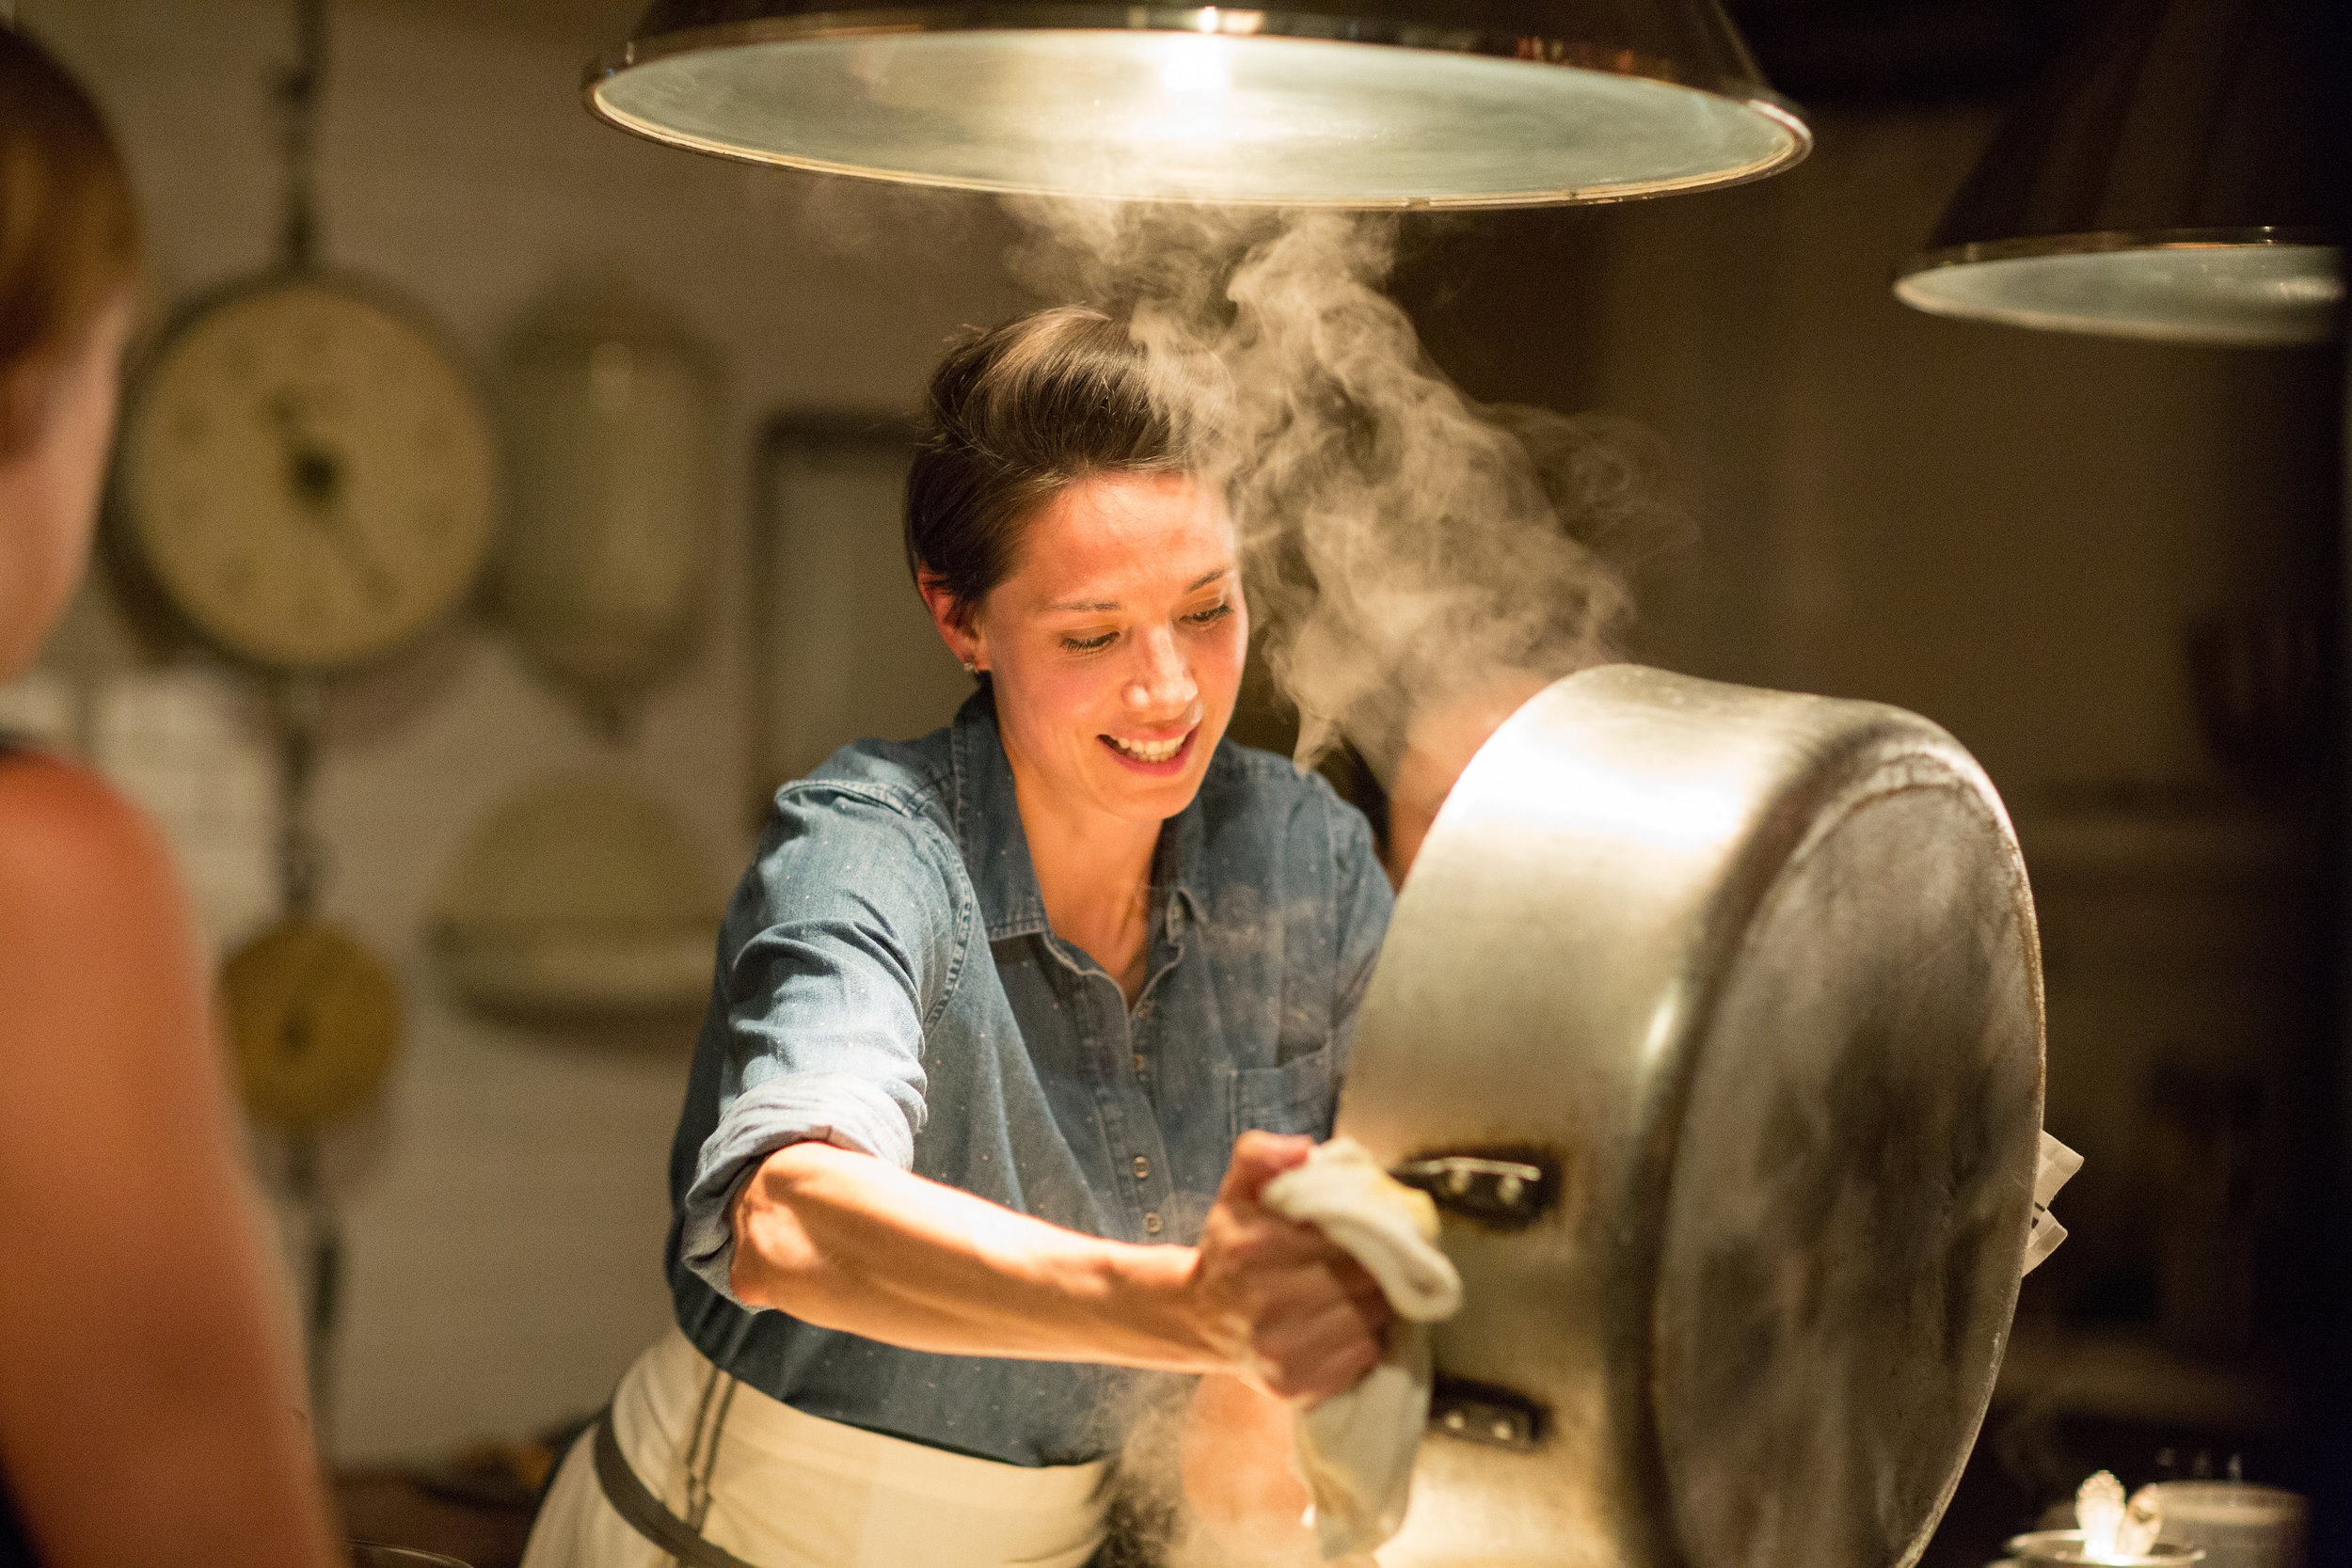 Alicia Pours Pasta.jpg